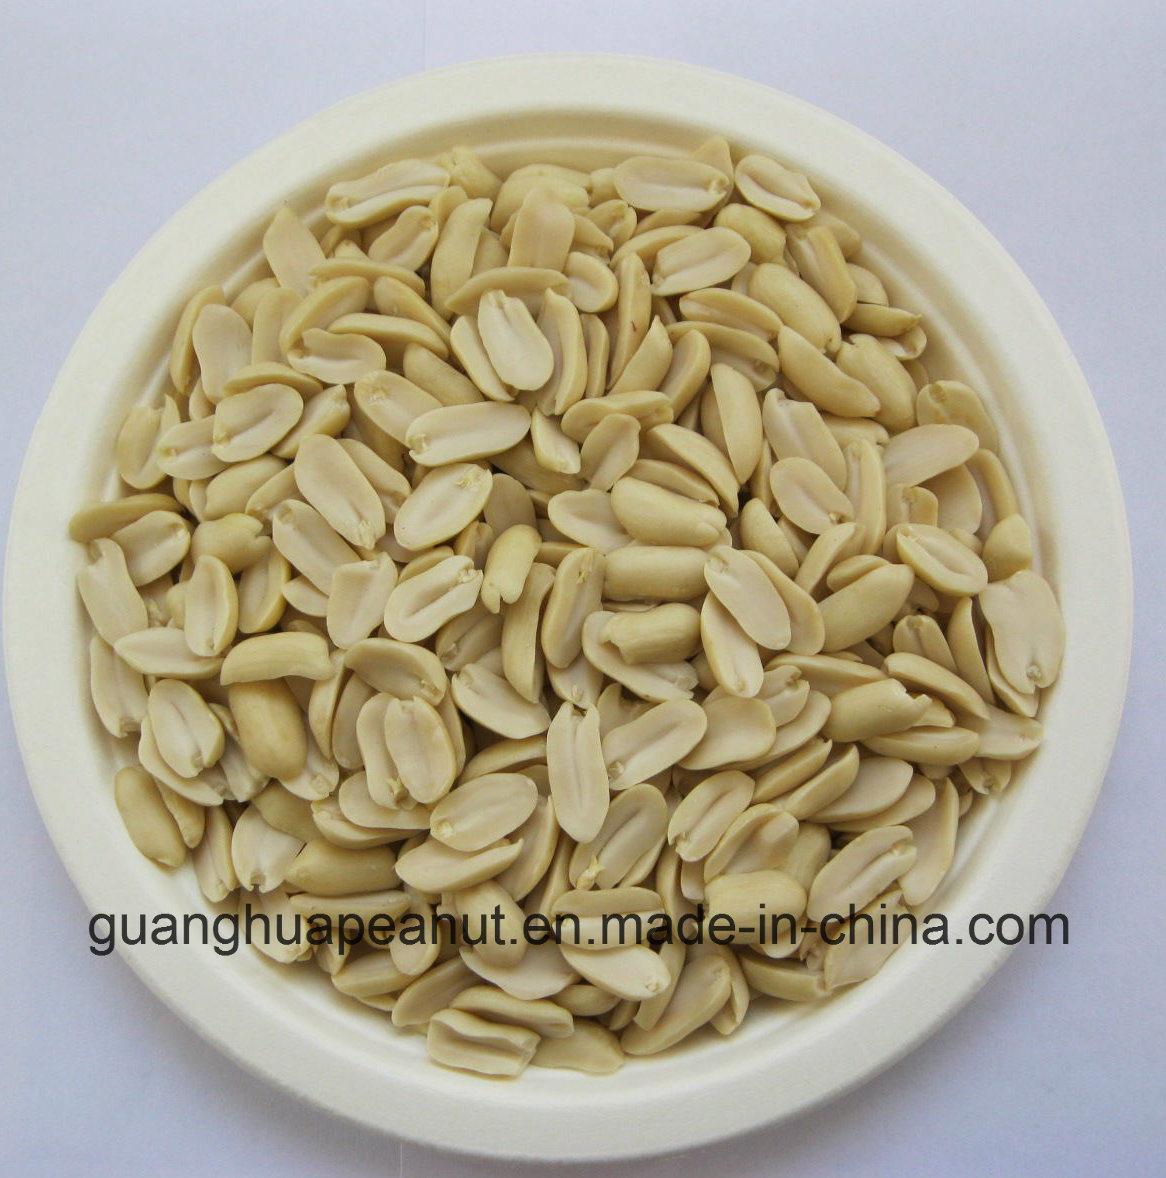 New Crop Blanched Peanut Split